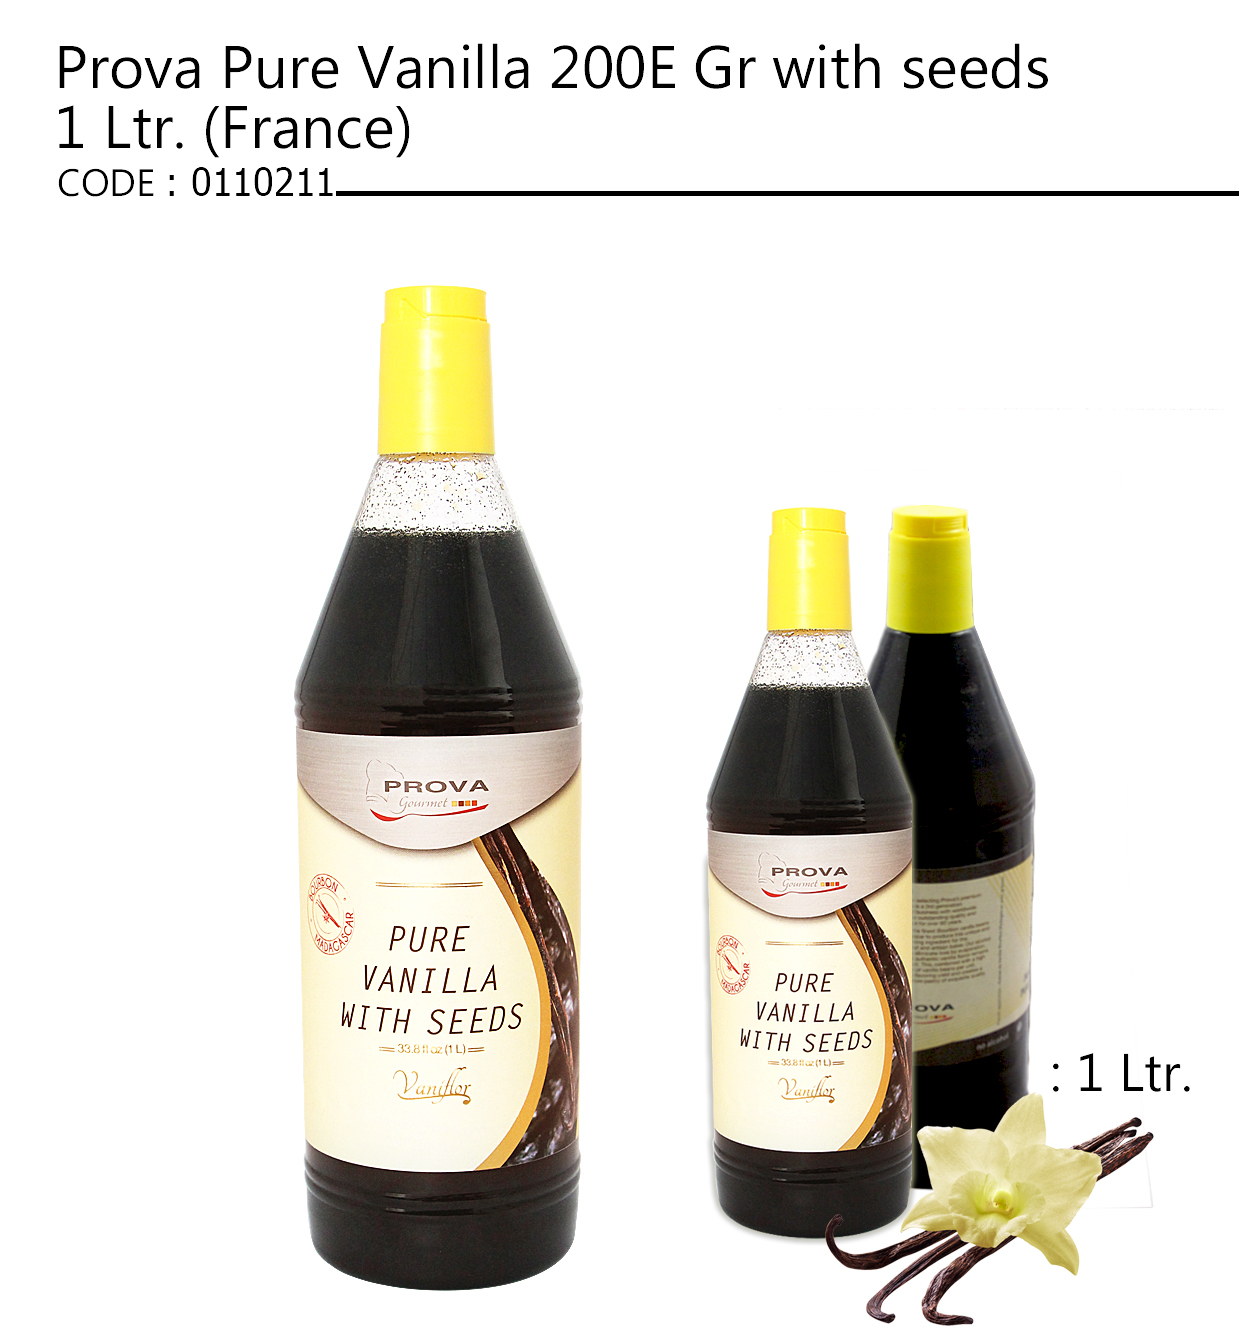 Prova Pure Vanilla 200E Gr with seeds 1 Ltr. (France)